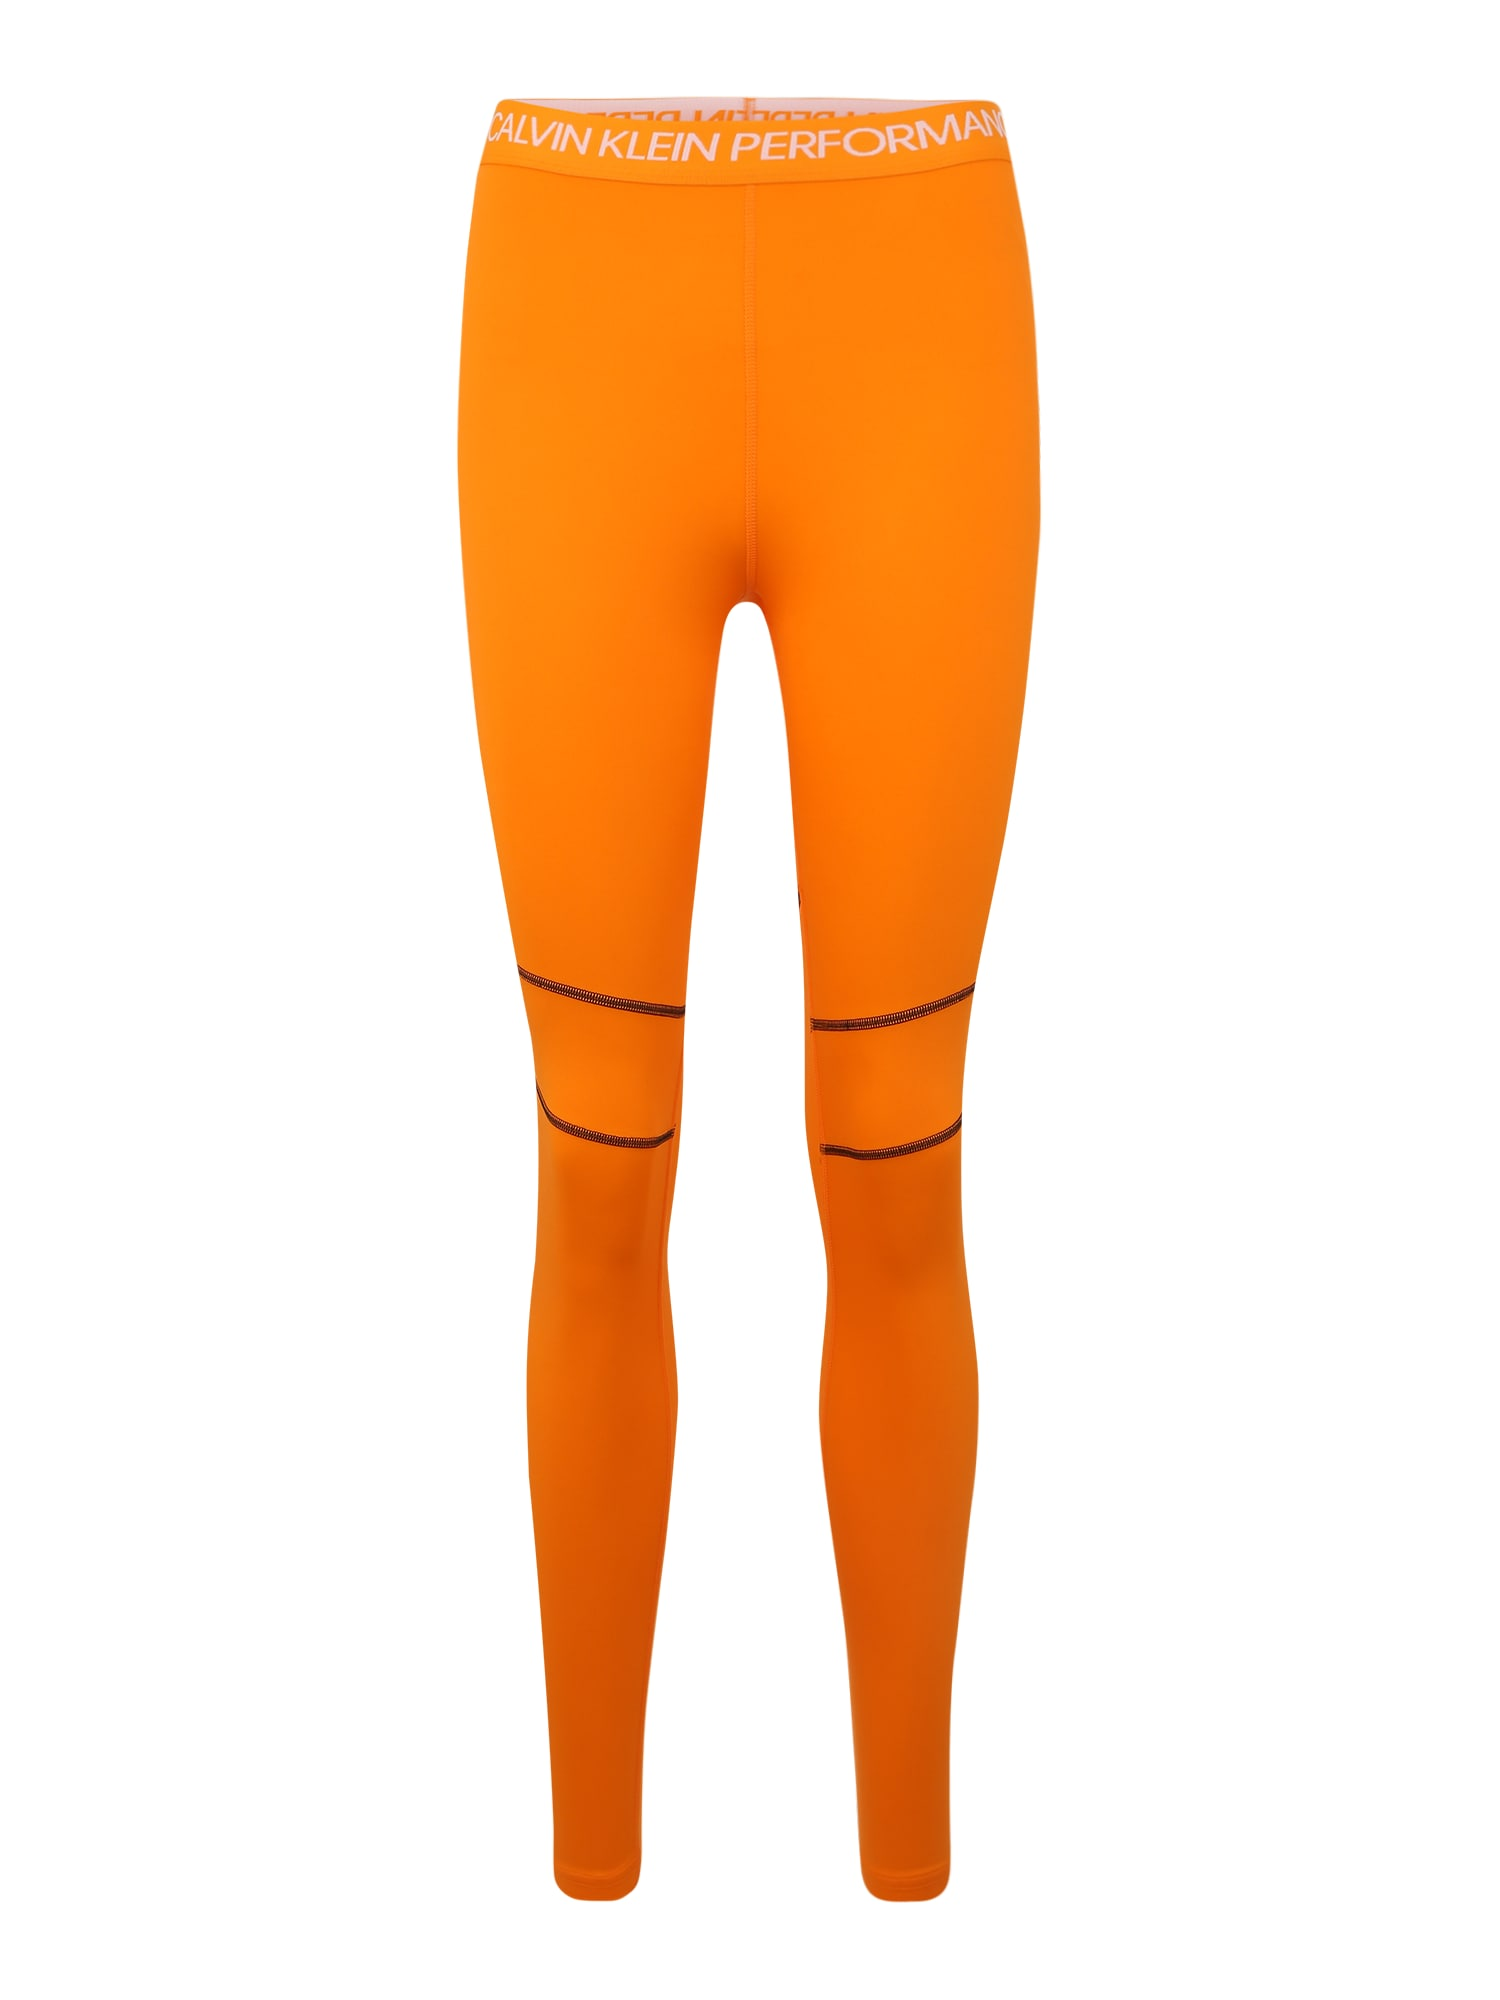 Sport-Leggings | Sportbekleidung > Sporthosen > Sportleggings | Orange | Calvin Klein Performance